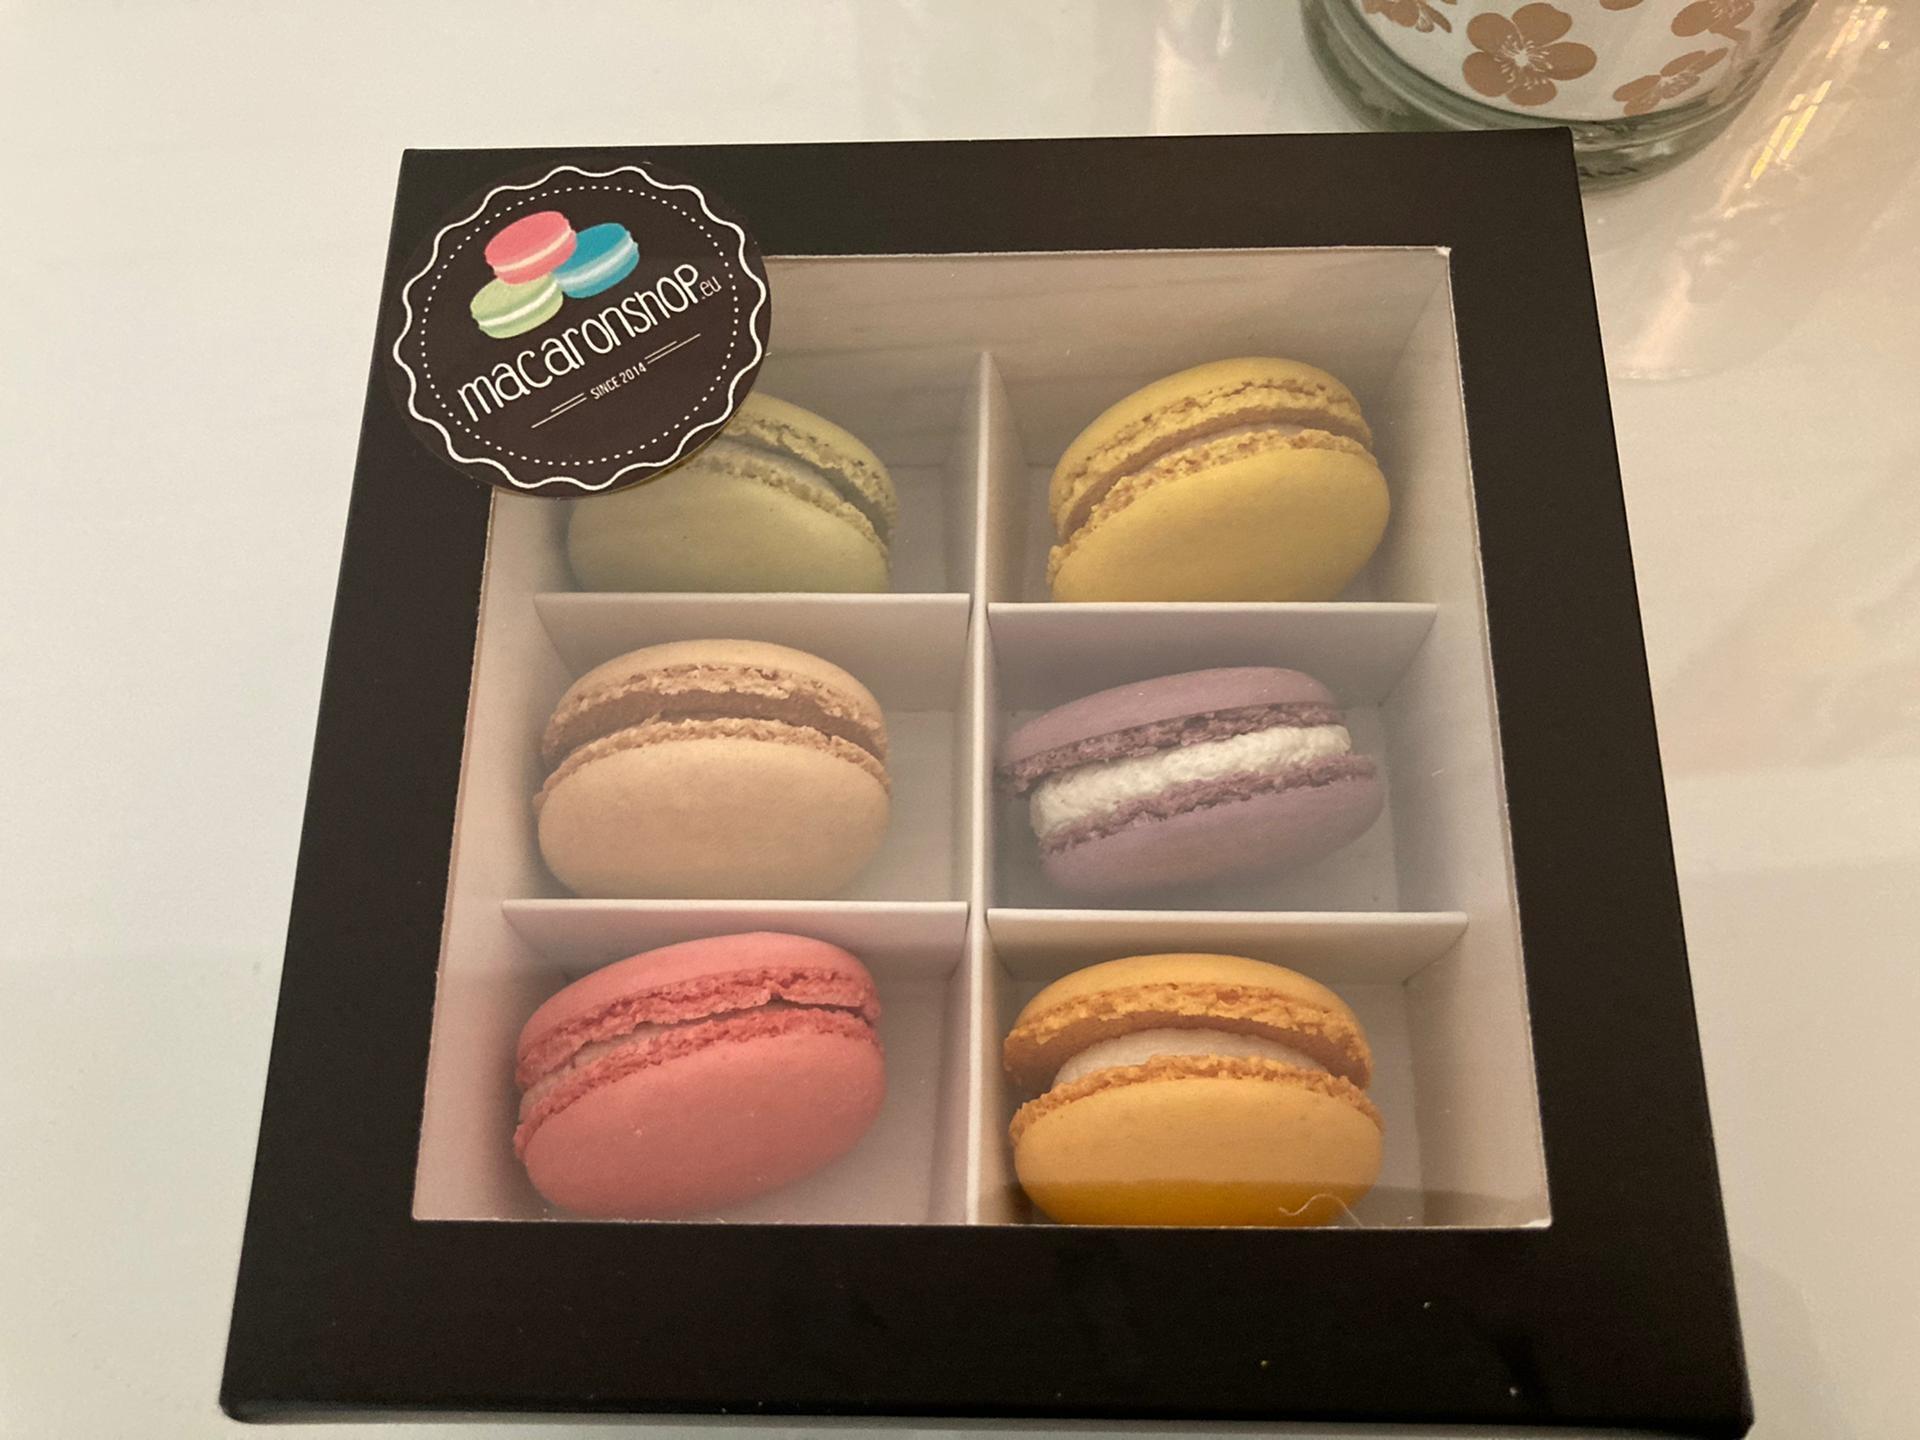 Macaronshop Macaron Luxe Box Varia (6 stuks)